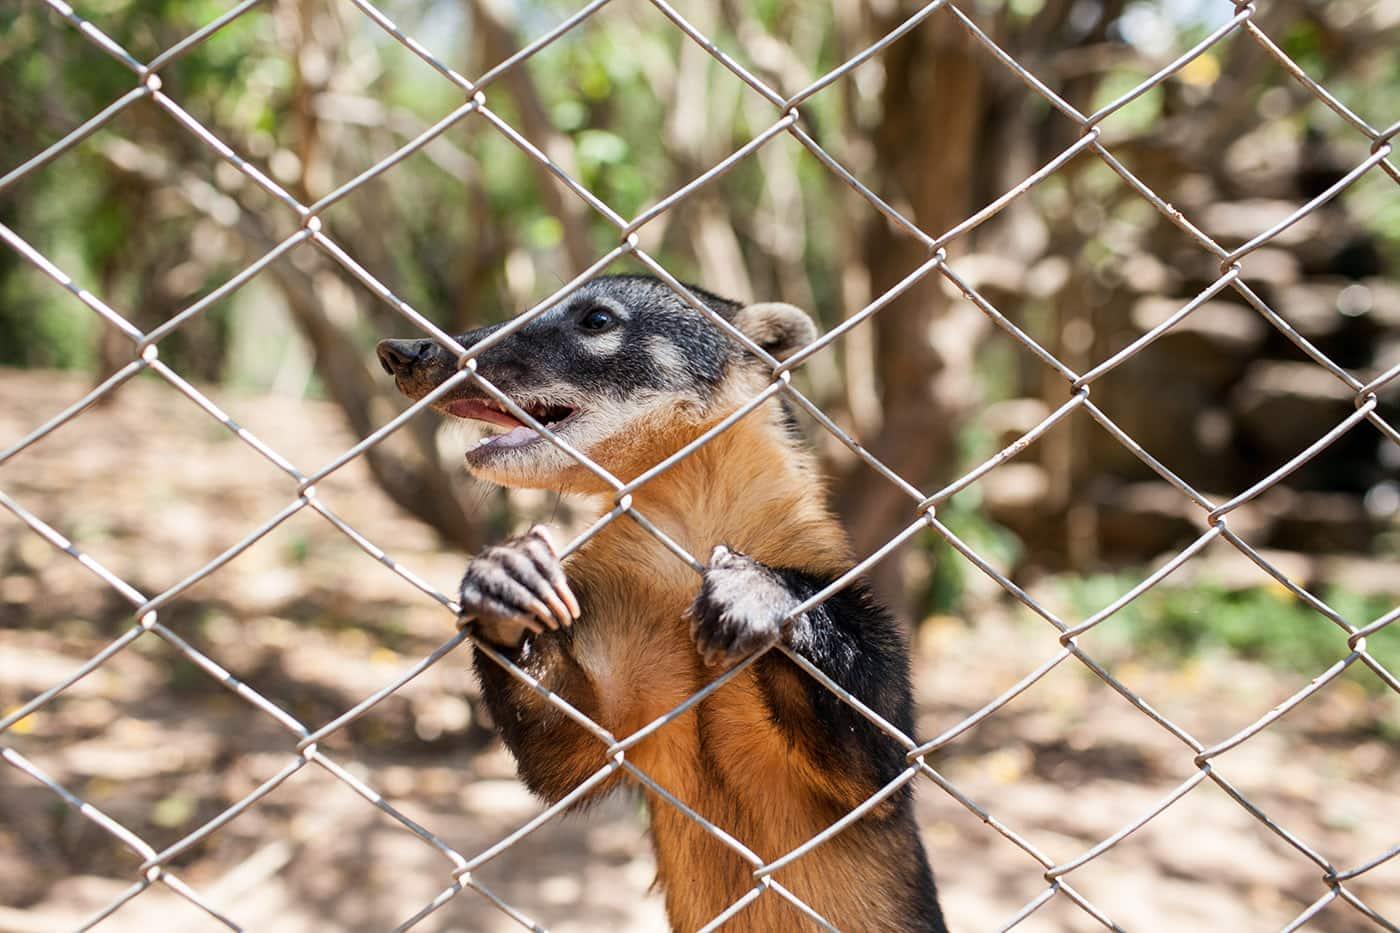 Refugio Zoologico refuge for rescued animals in Samaipata, Bolivia